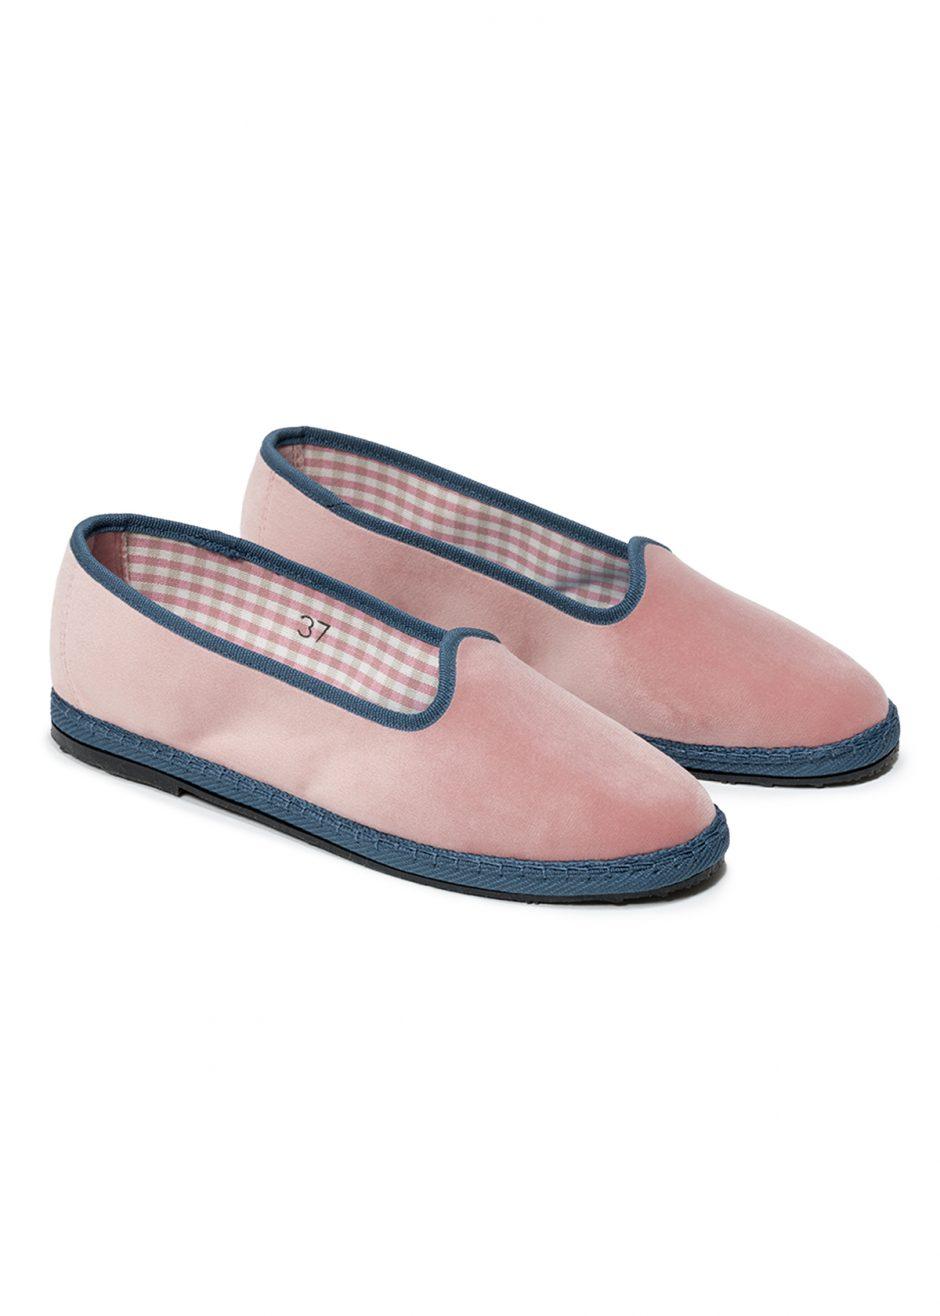 Rialto – Furlana powder pink velvet